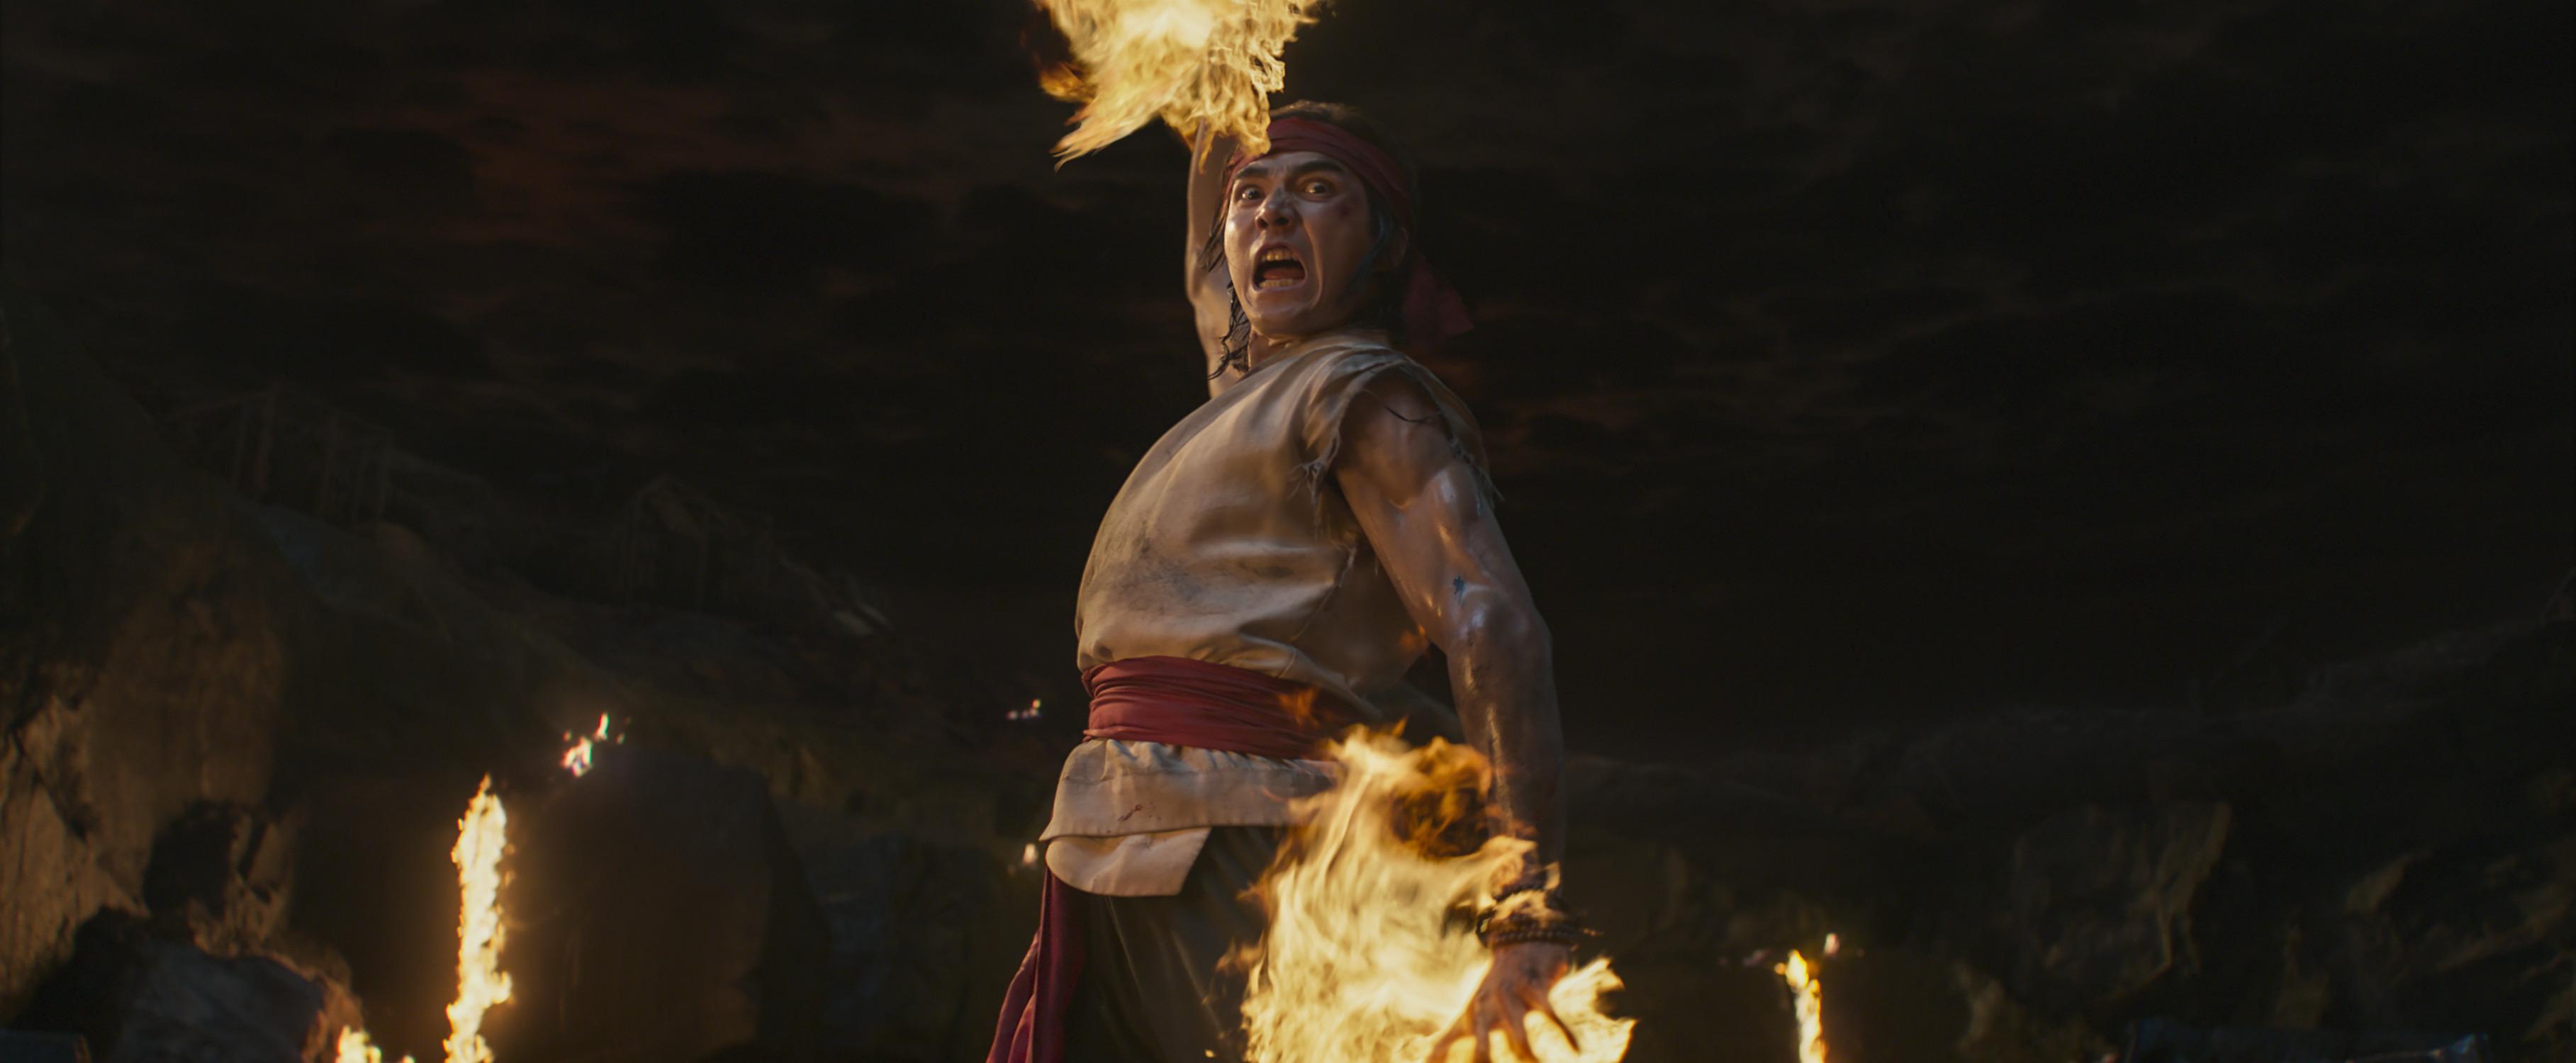 Ludi Lin screams as he prepares a burning-hands attack in his role as Liu Kang in 2021's Mortal Kombat